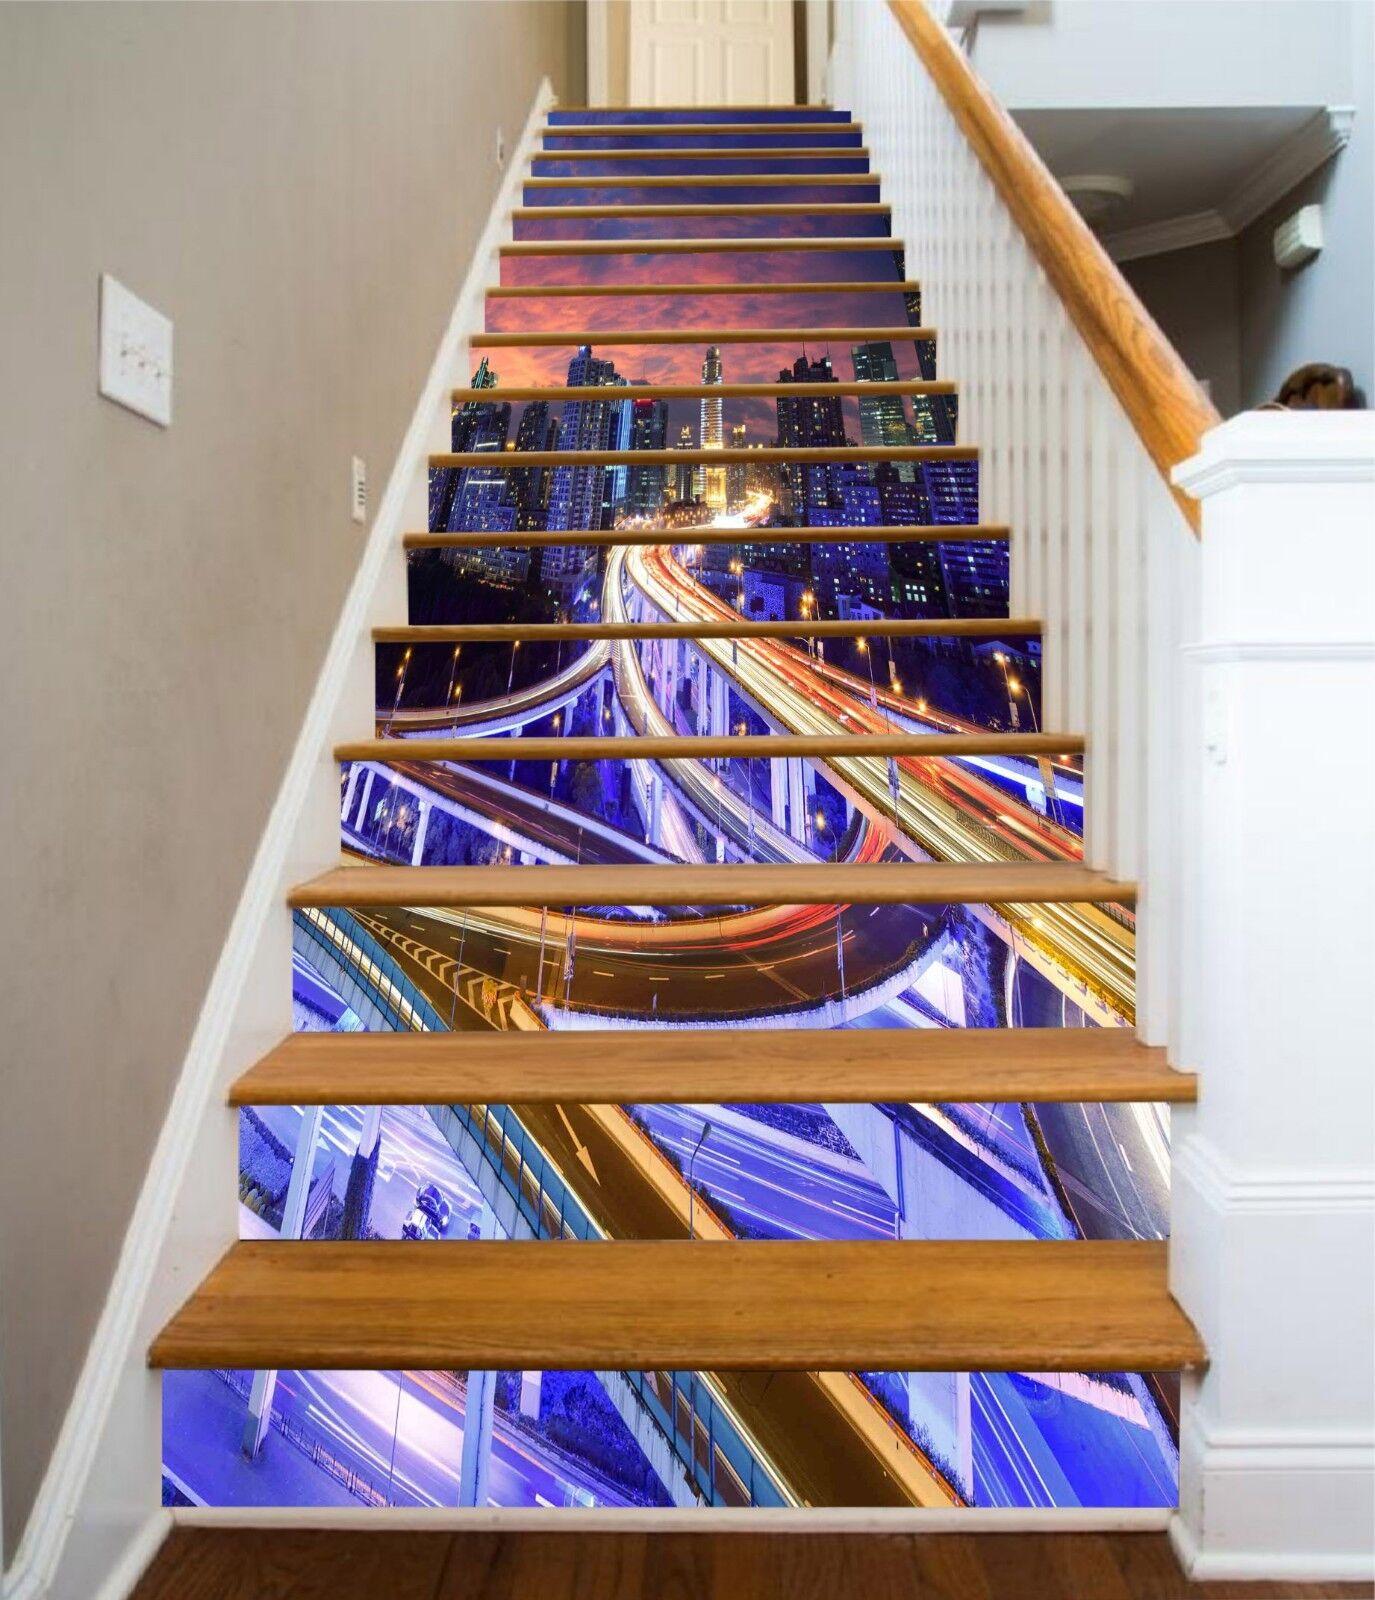 3D Light City Stair Risers Decoration Photo Mural Vinyl Decal Wallpaper UK